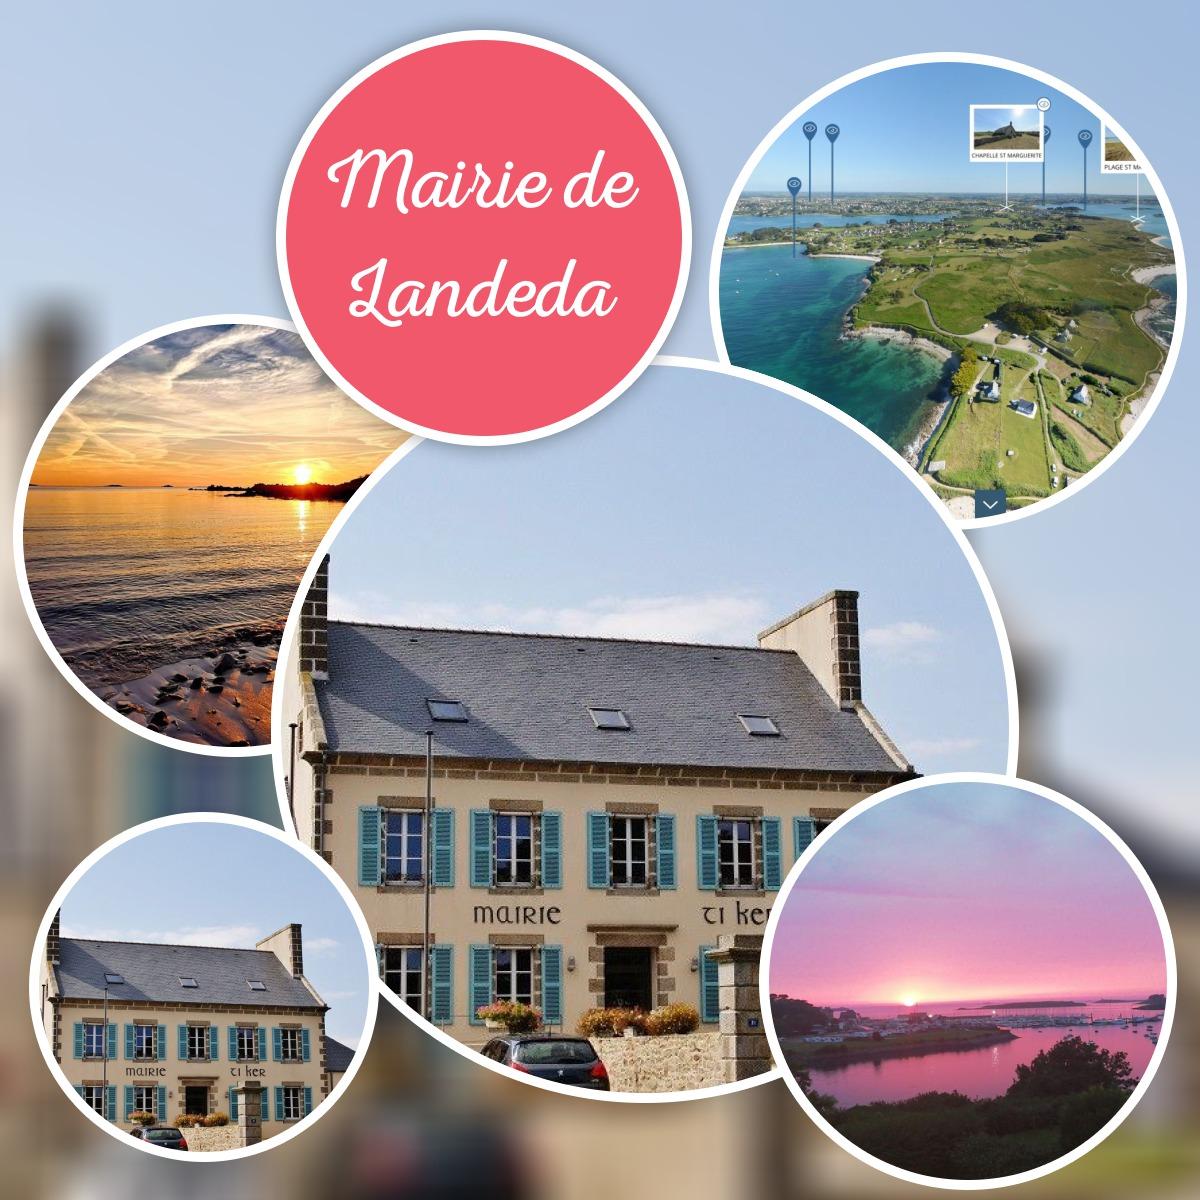 Mairie de Landeda